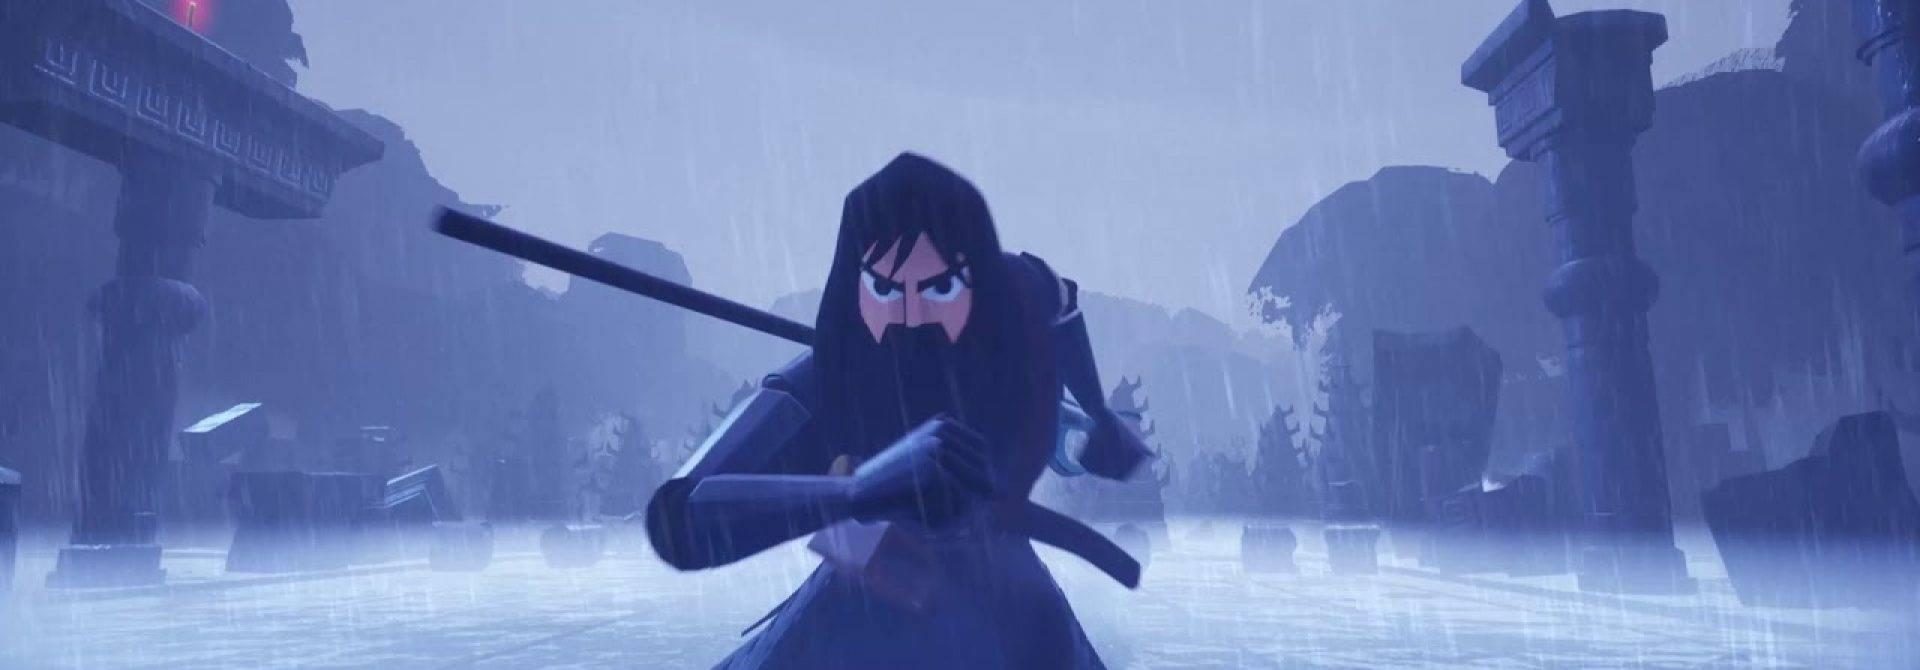 Samurai Jack: Battle Through Time Announced For Summer